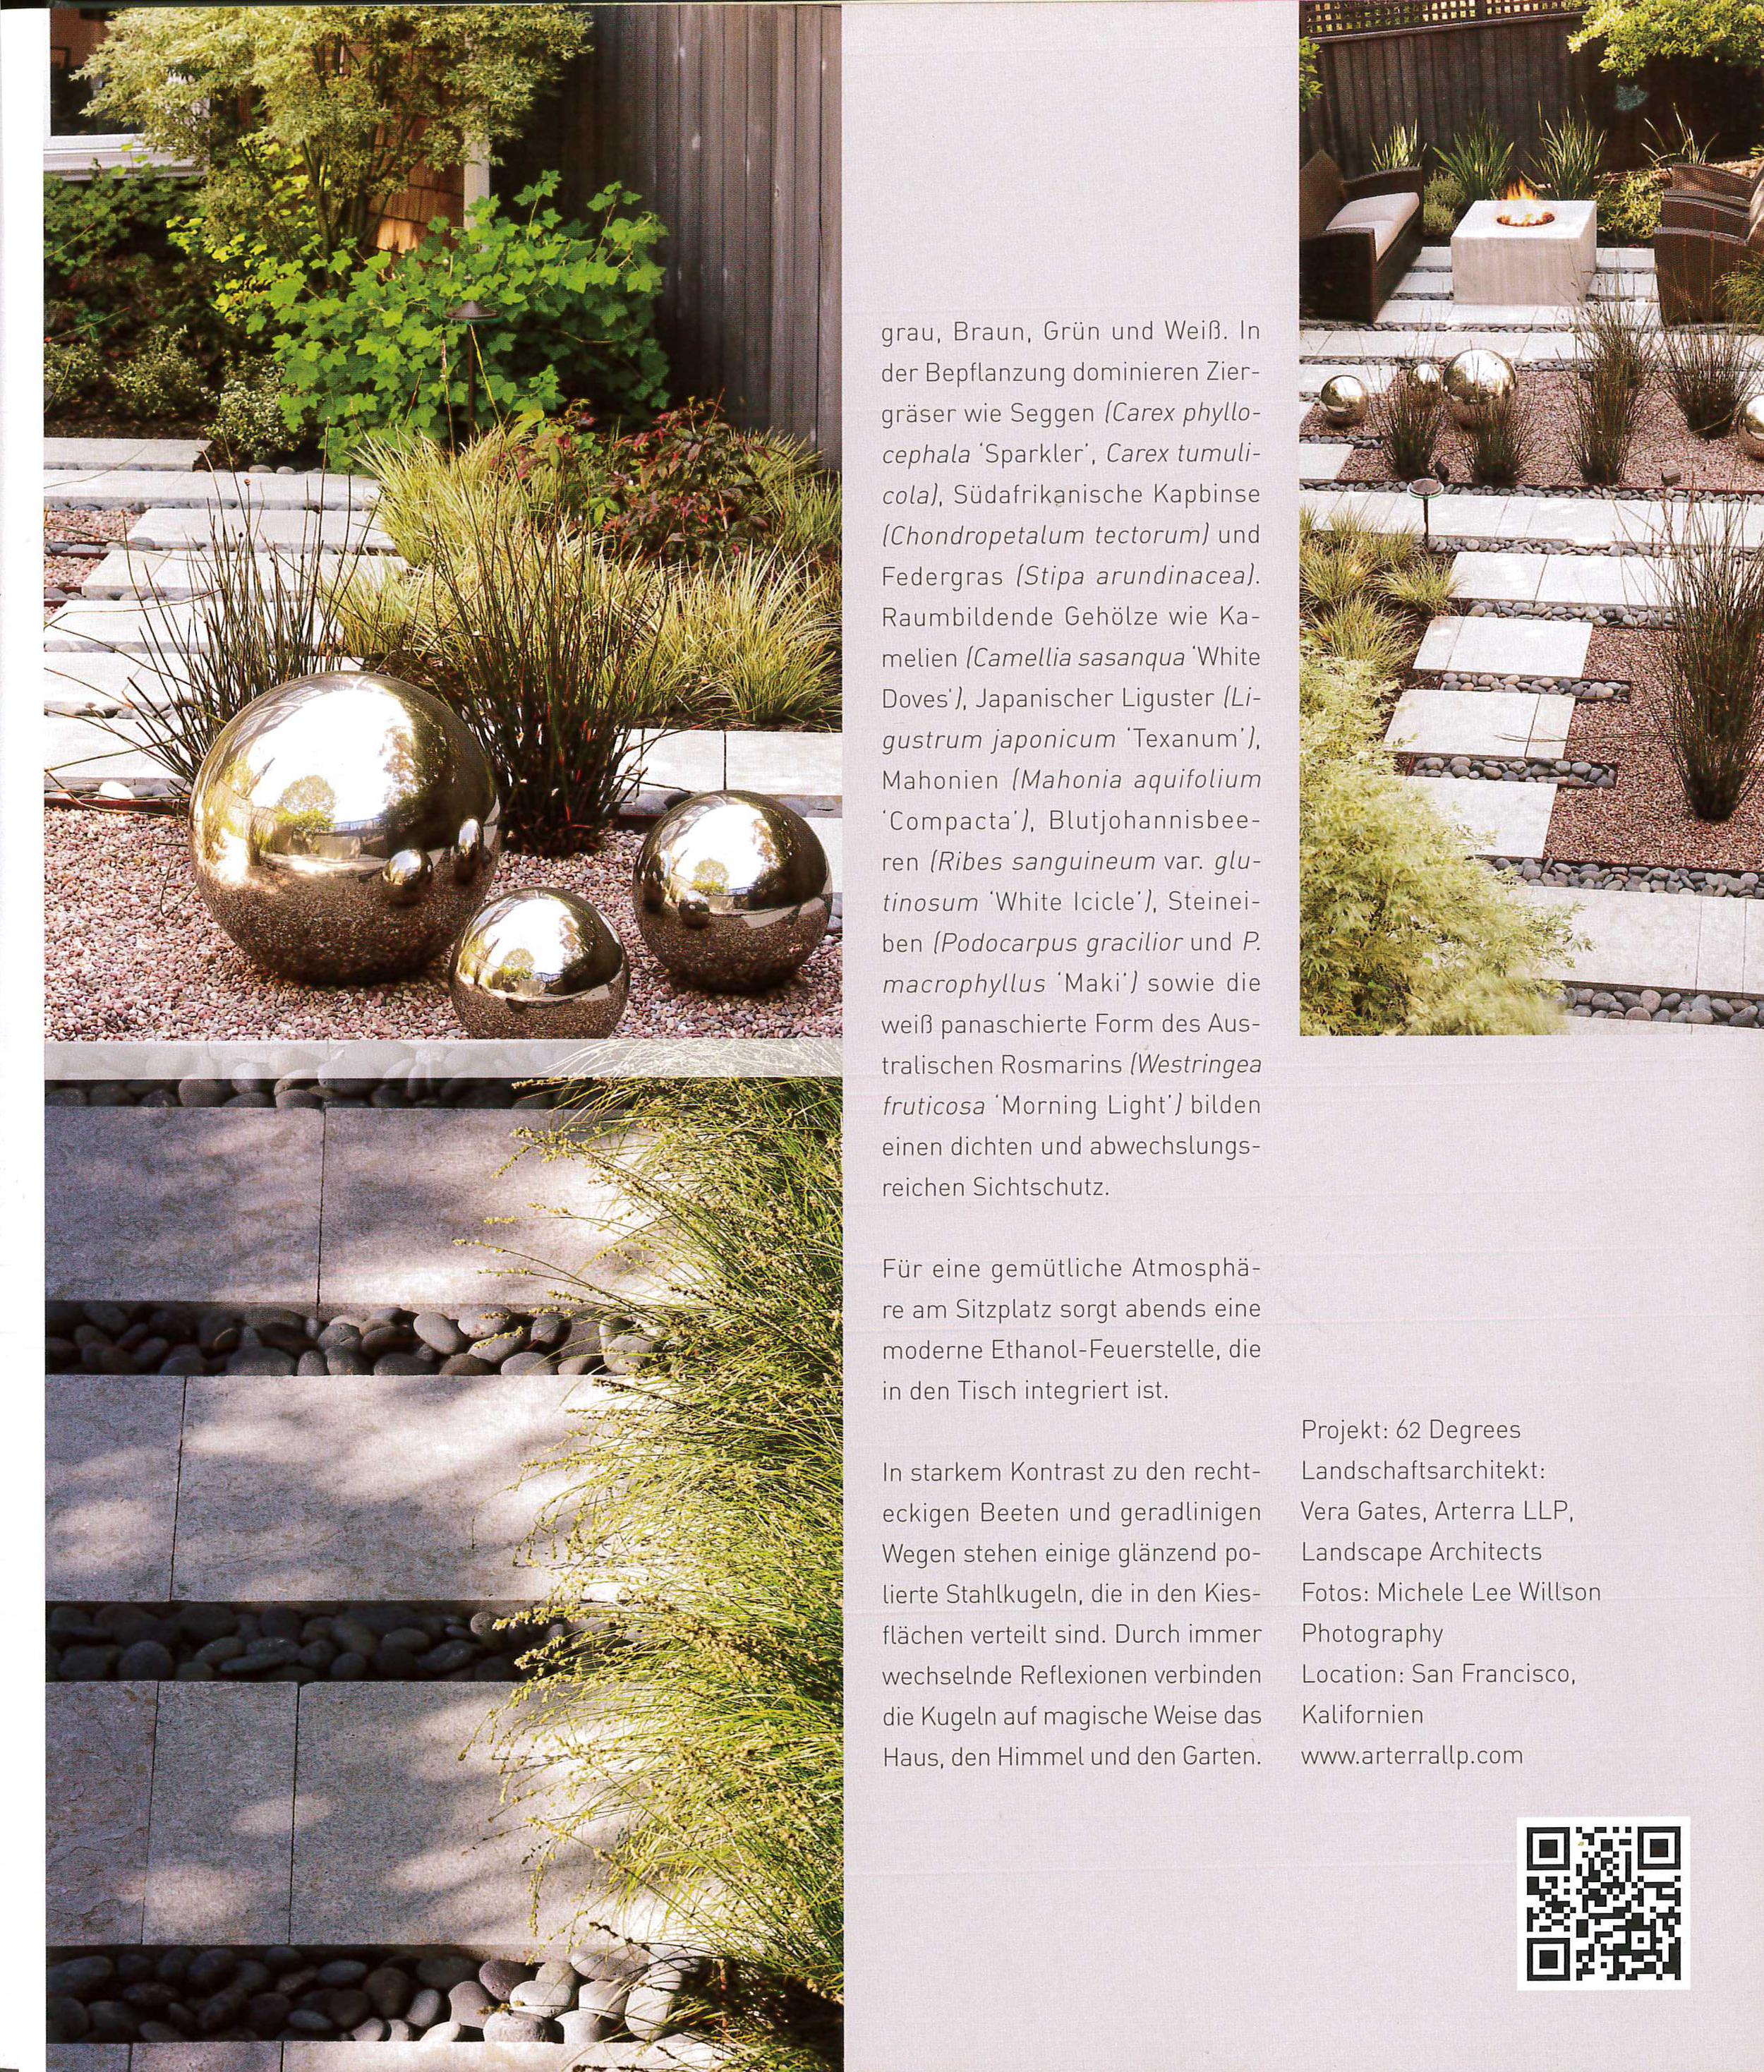 75ce4-garden-within-walls_pg04.jpg